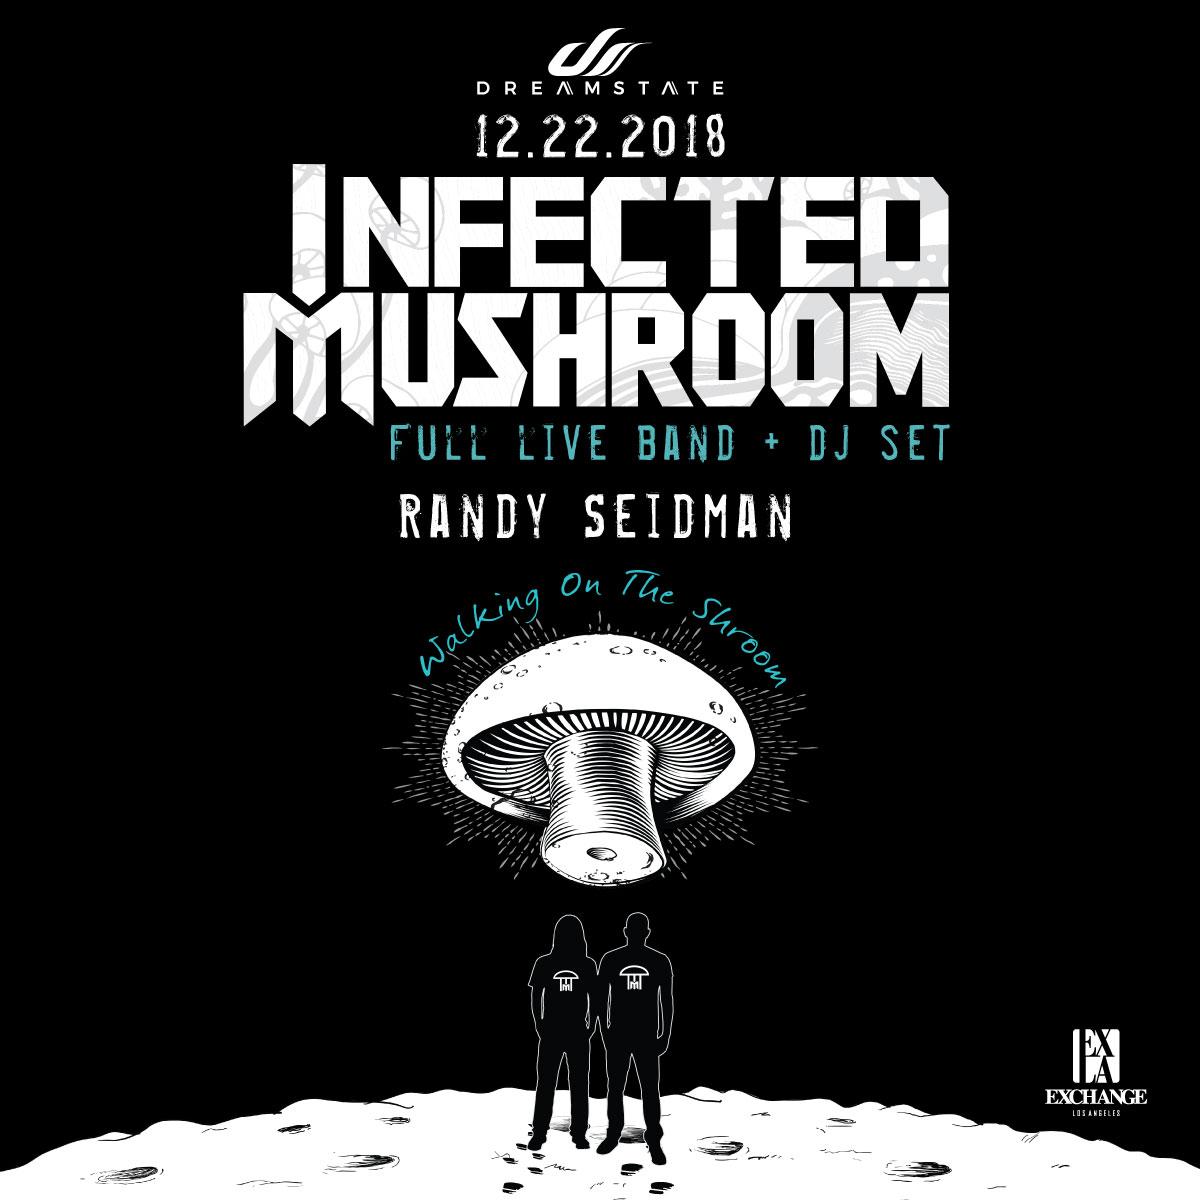 Infected Mushroom (Full Live Band + DJ Set)